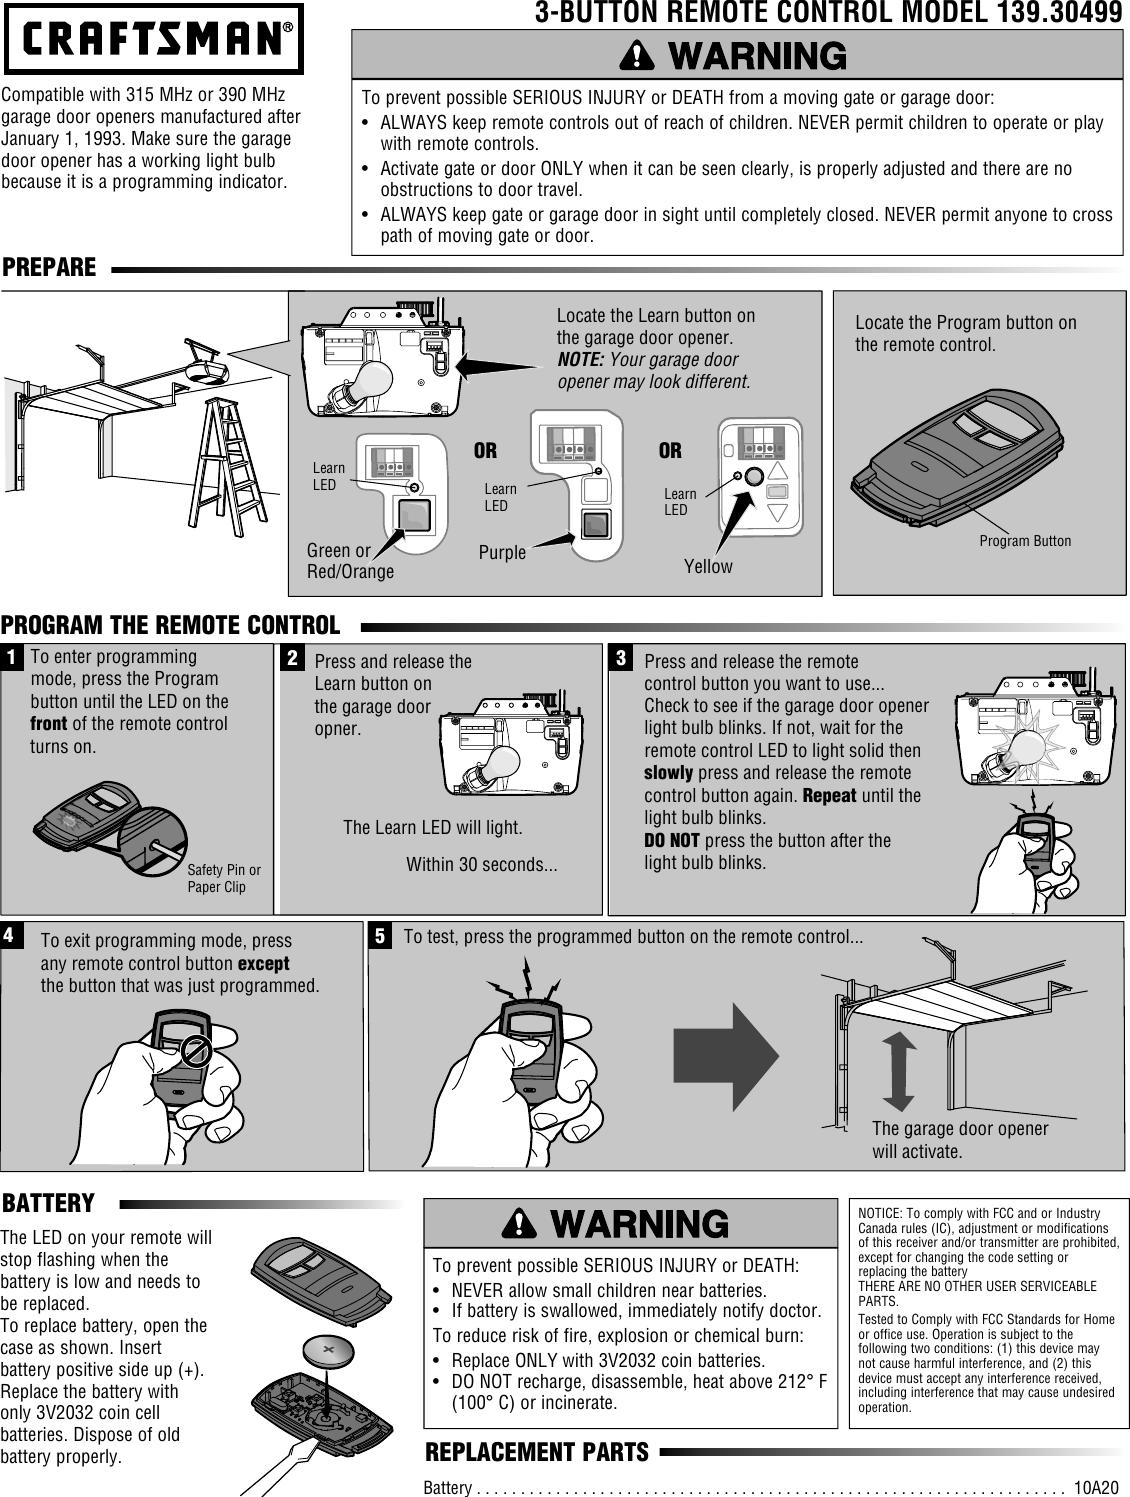 Craftsman Garage Door Opener 3 Function Compact Remote Control Owners Manual